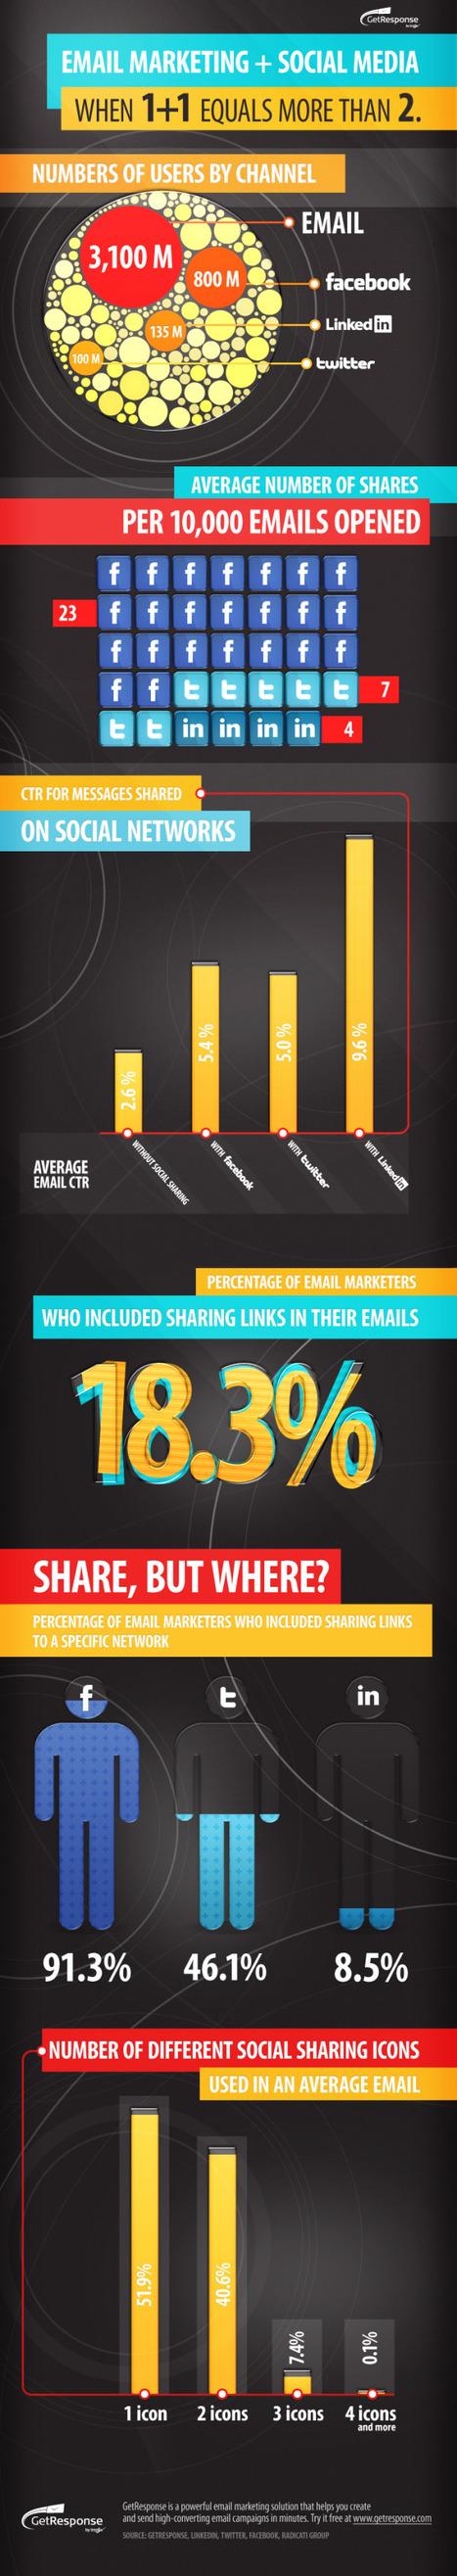 The 10 Best Marketing Infographics of 2012 (So Far) | Mídias Sociais - Tendências 2012 | Scoop.it